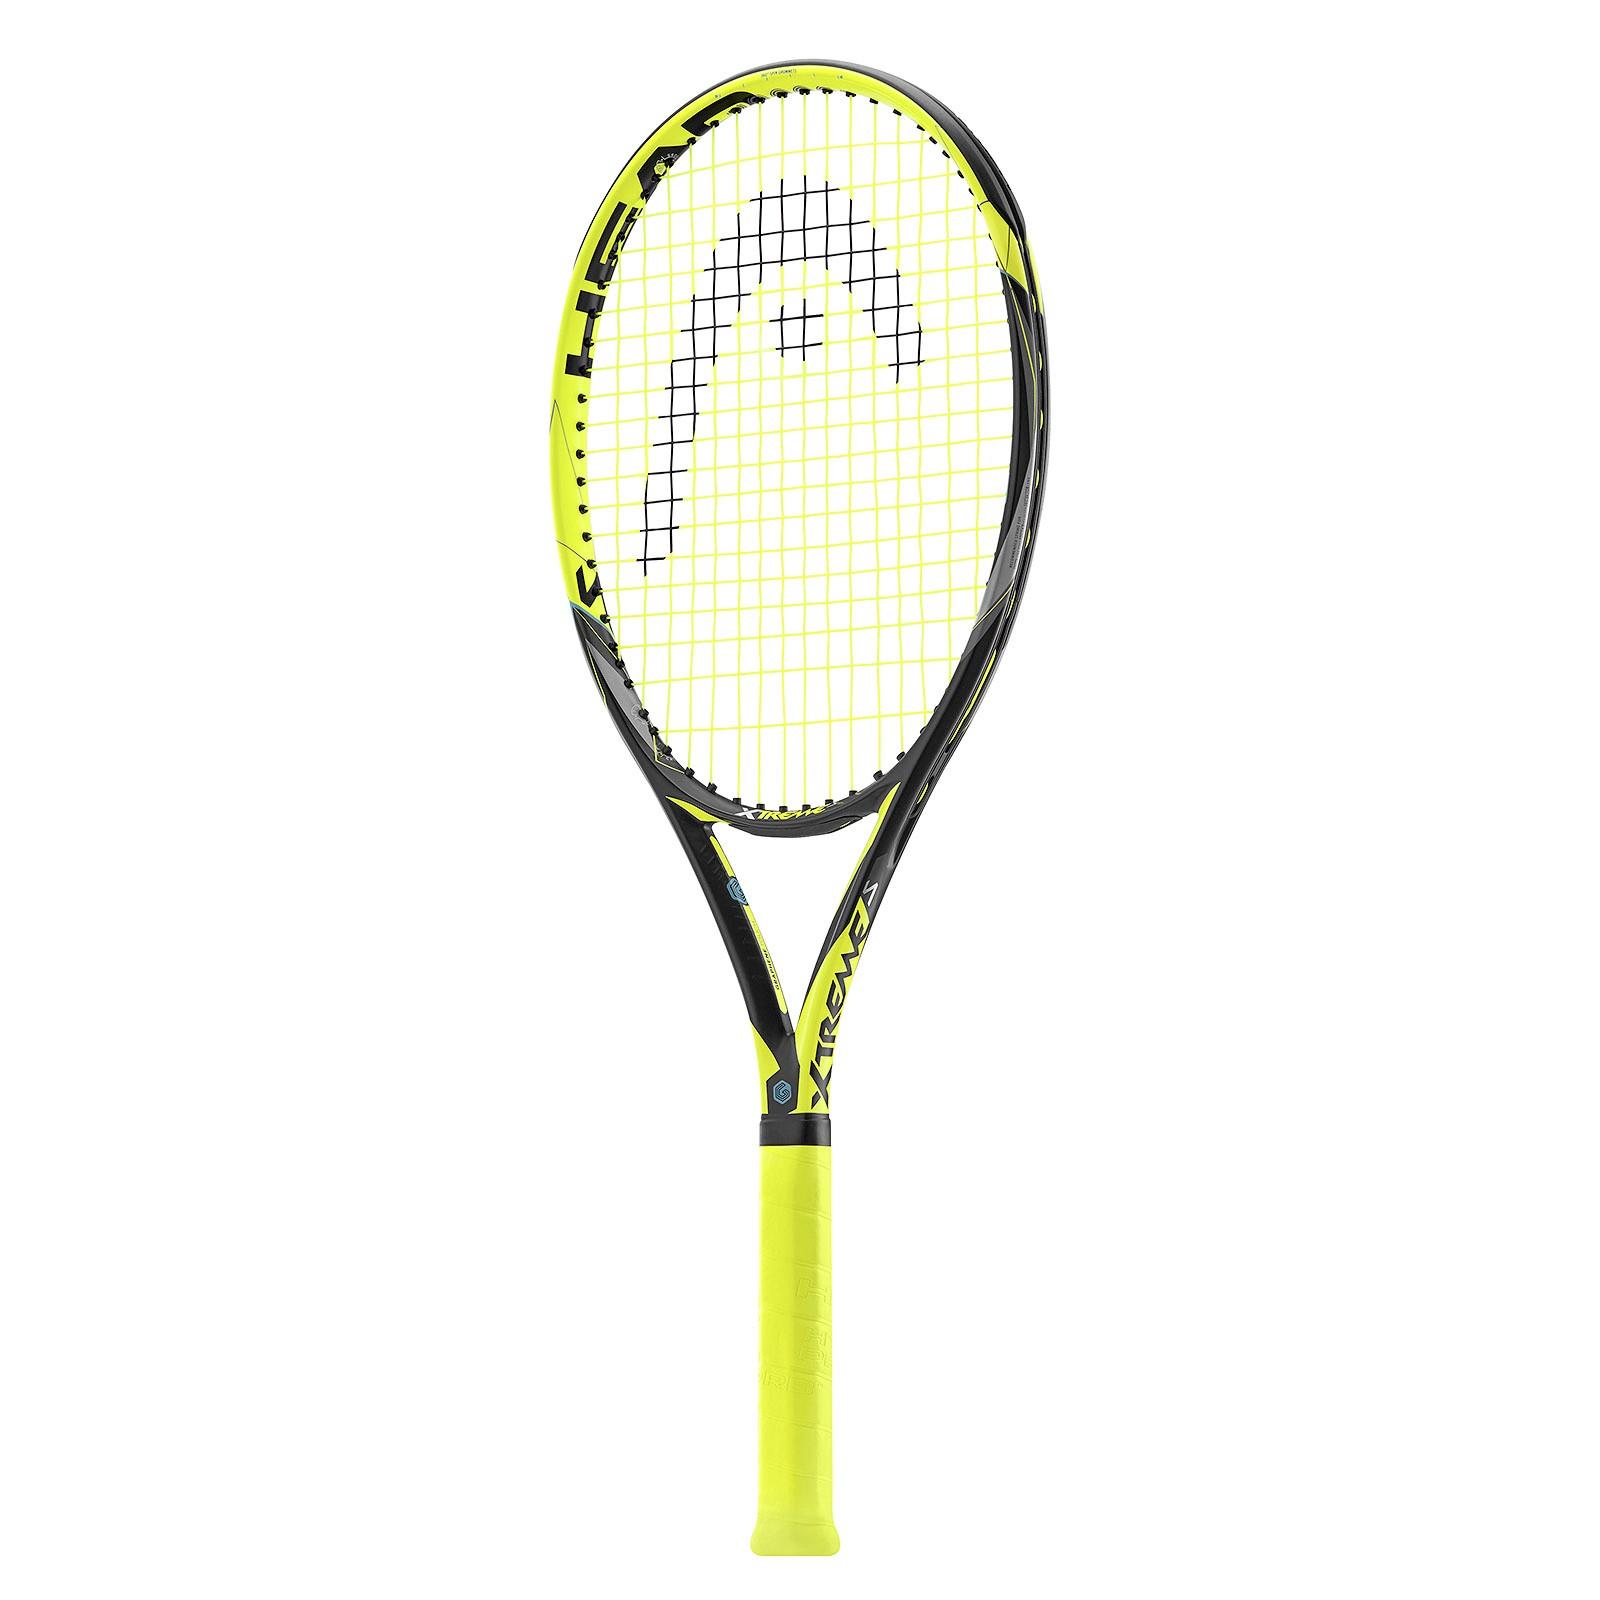 Rakieta tenisowa Head Graphene Touch Extreme S